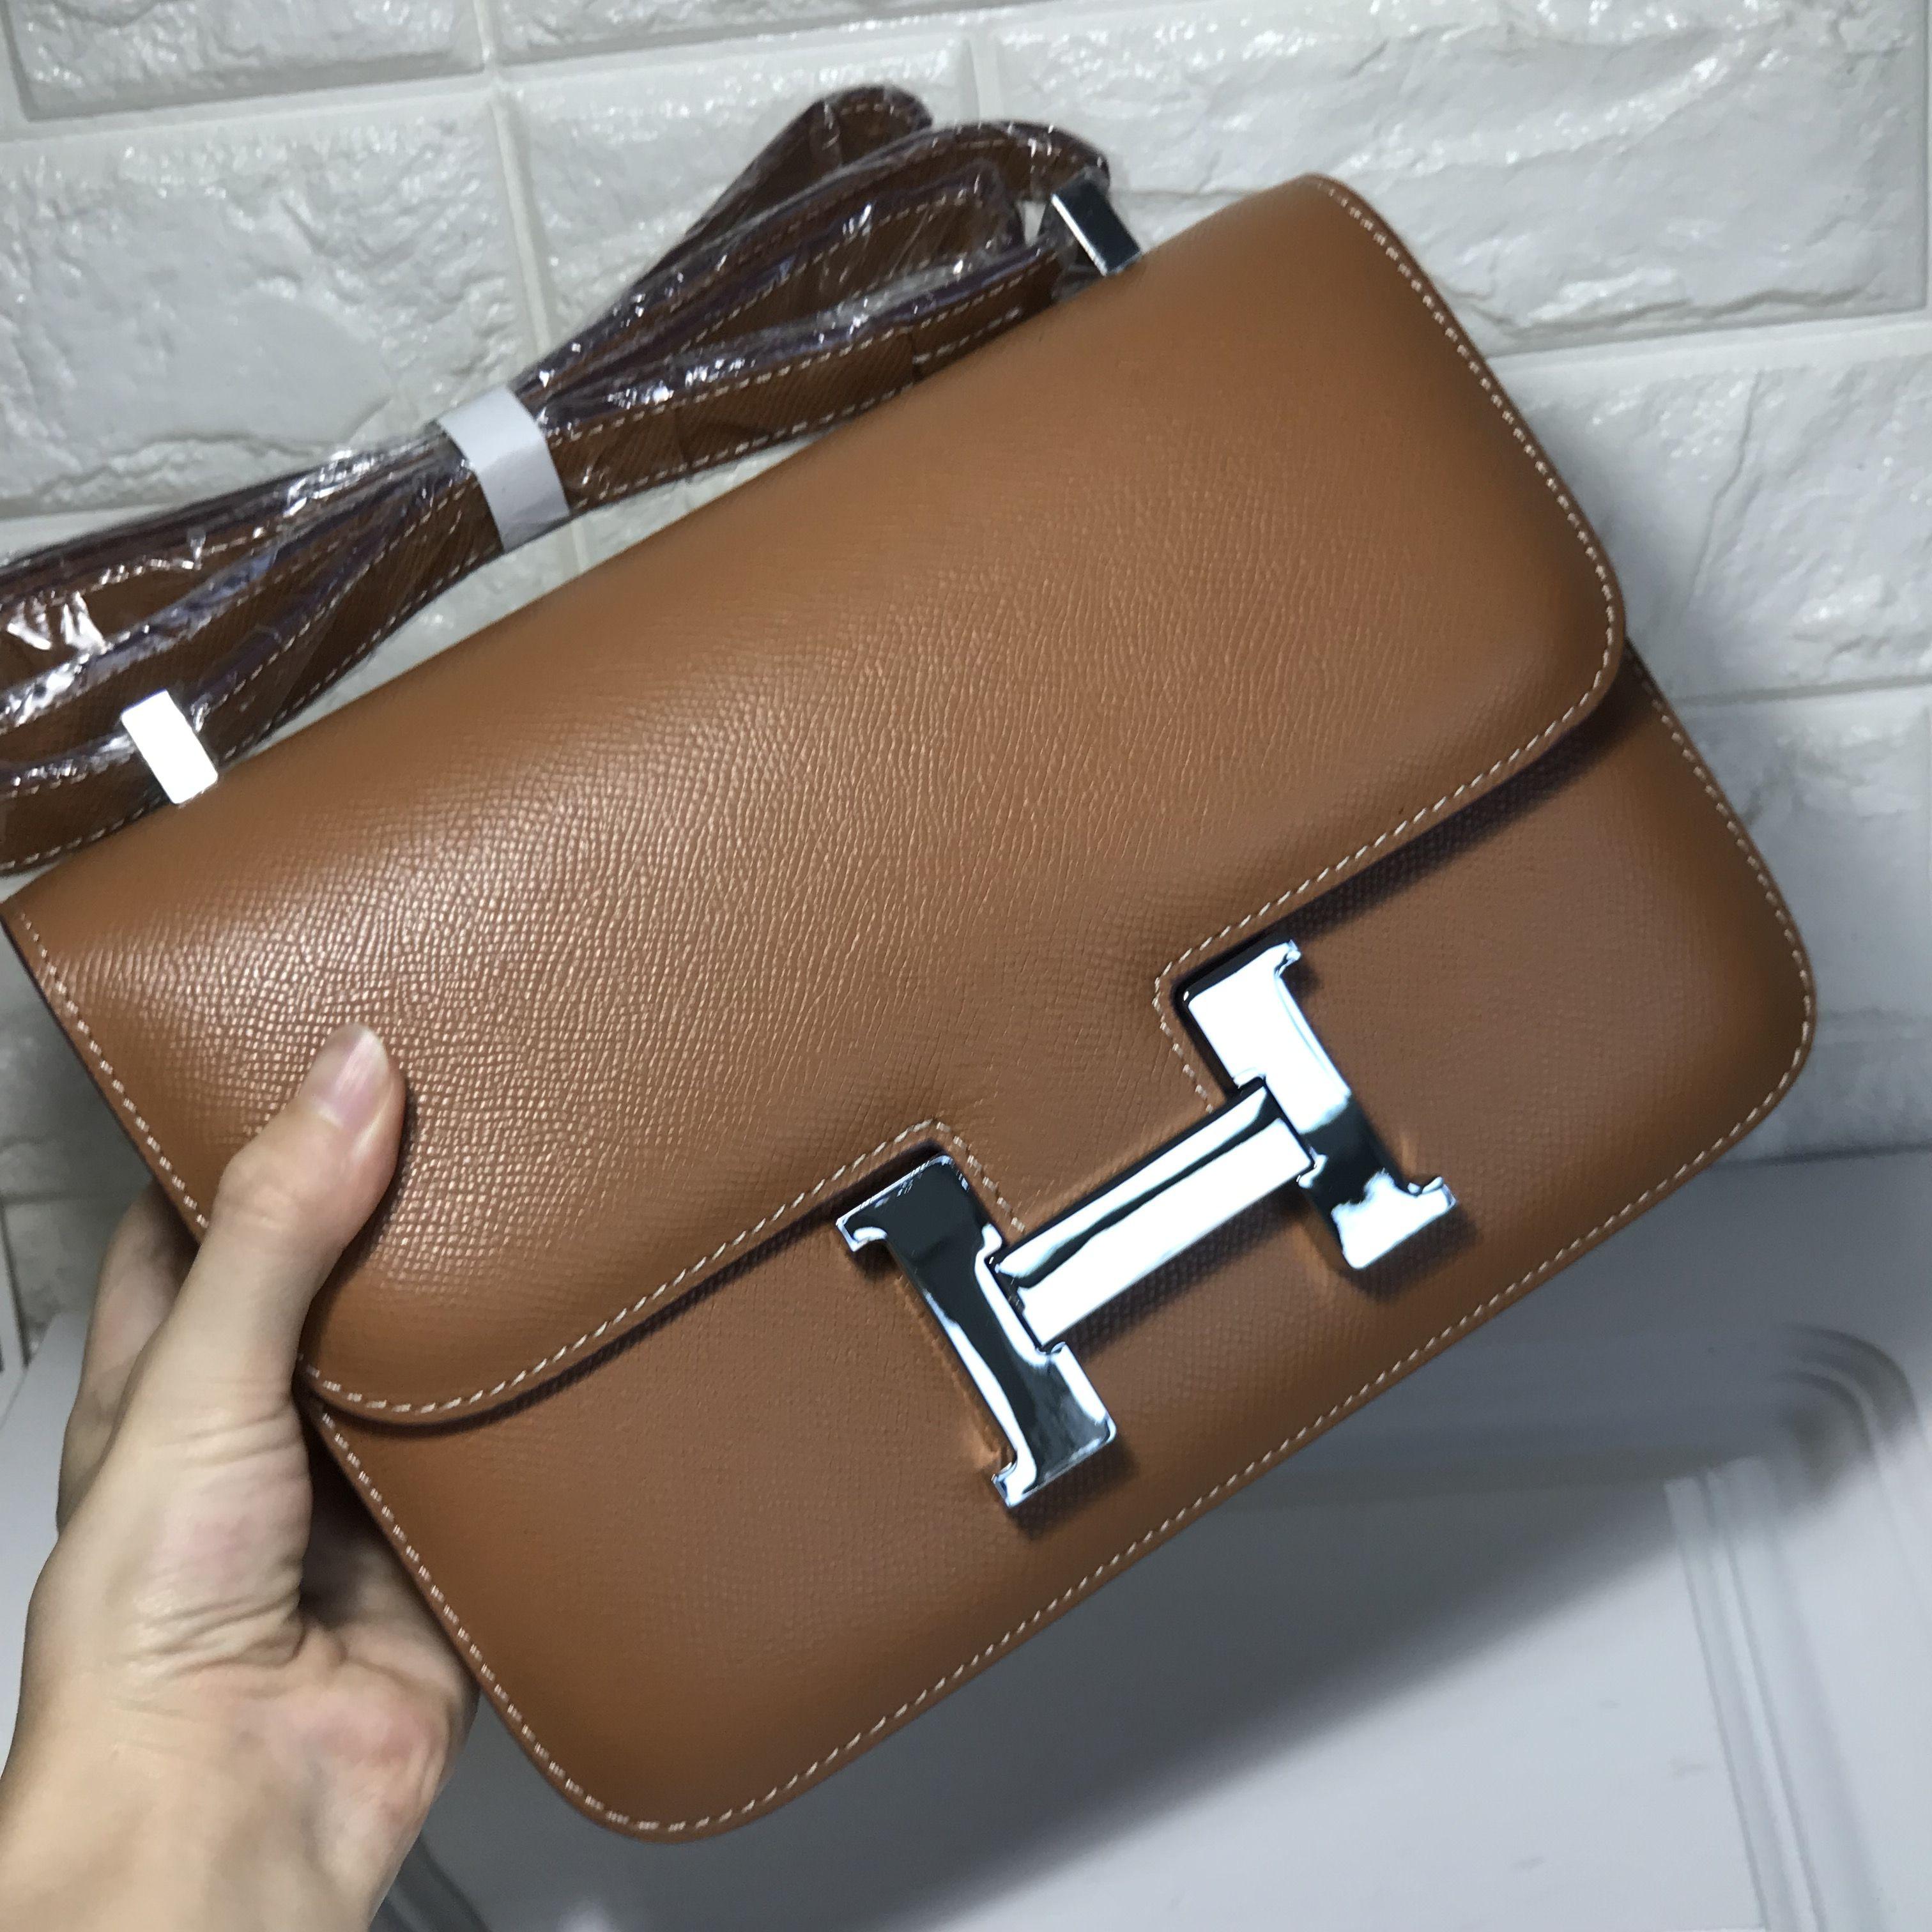 10ca62739021 ... wholesale hermes constance bag 23cm epsom leather camel silver 5b497  a8abe ...